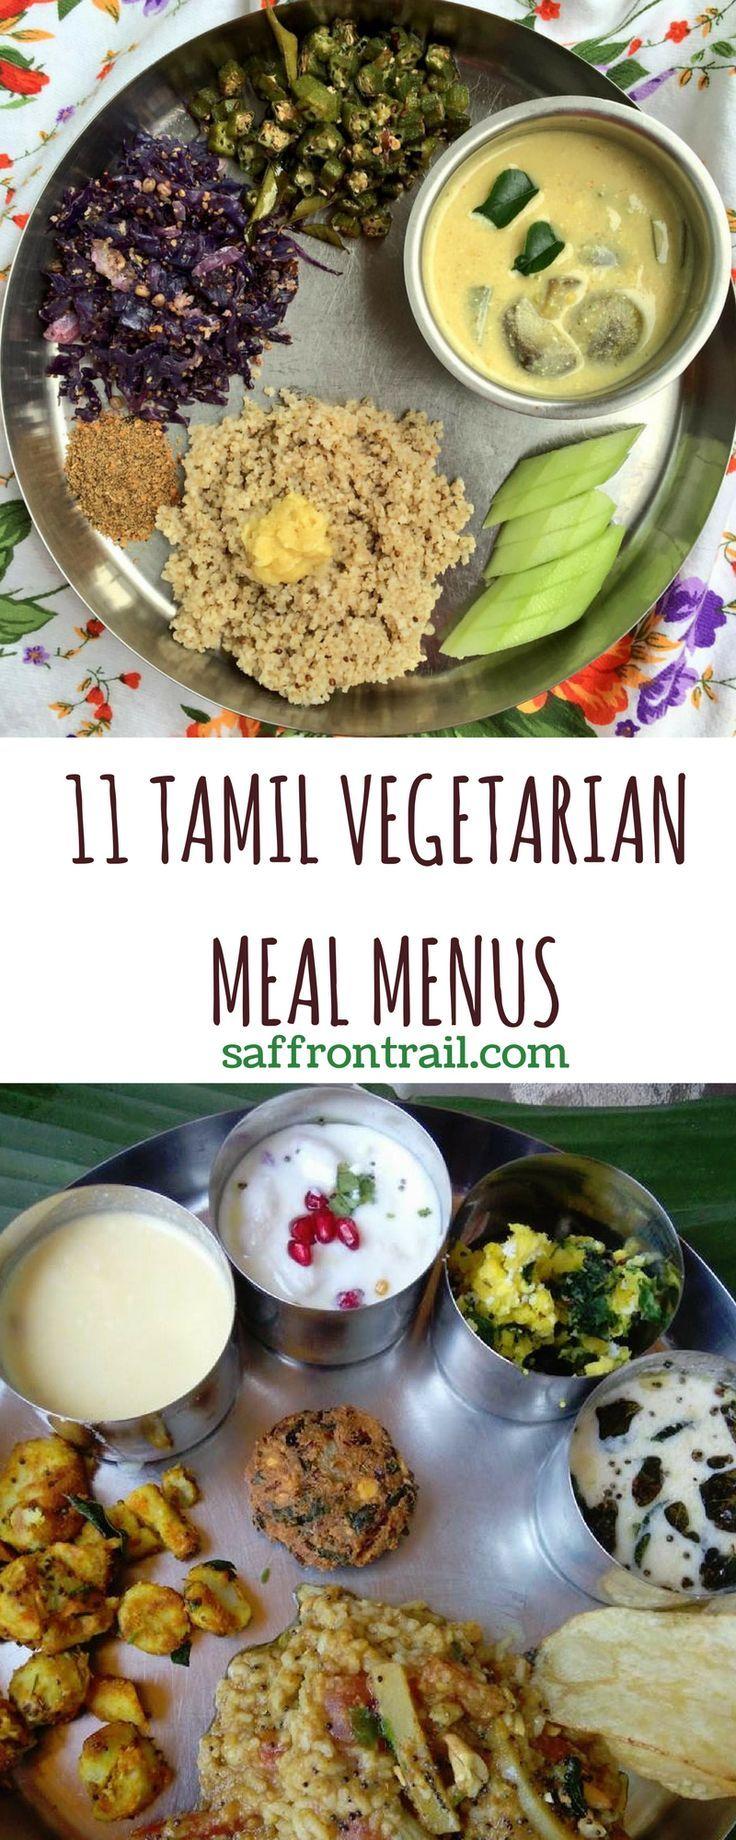 58 best tamil food vegetarian images on pinterest indian food 11 traditional tamil vegetarian lunch menus forumfinder Images